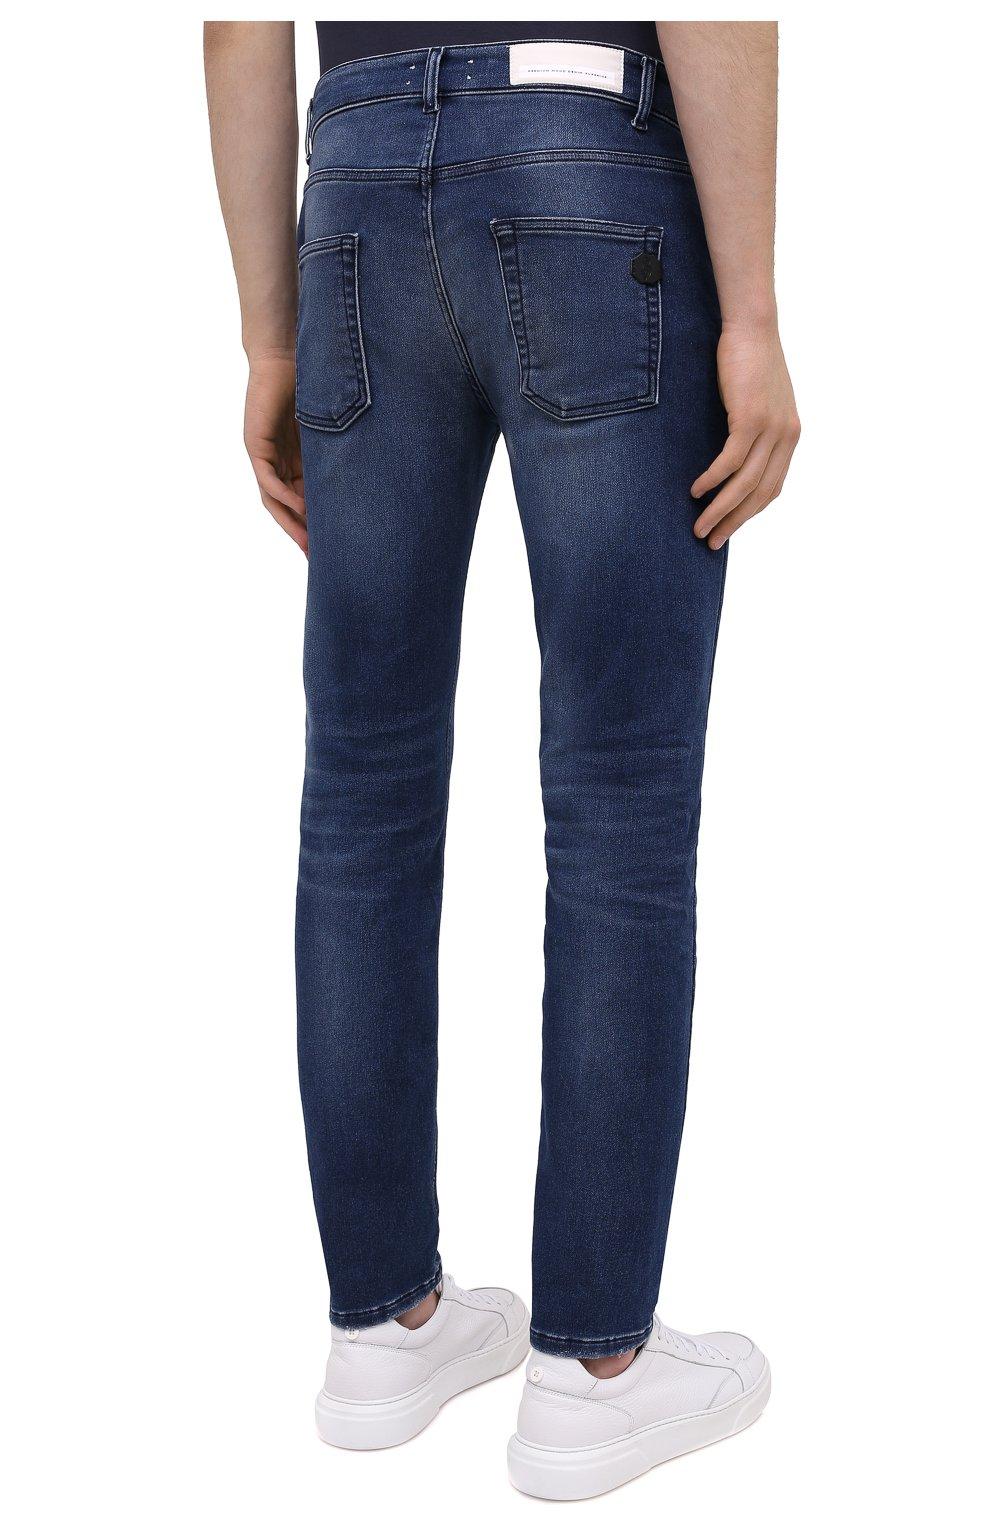 Мужские джинсы PREMIUM MOOD DENIM SUPERIOR темно-синего цвета, арт. F21 310337343/PAUL | Фото 4